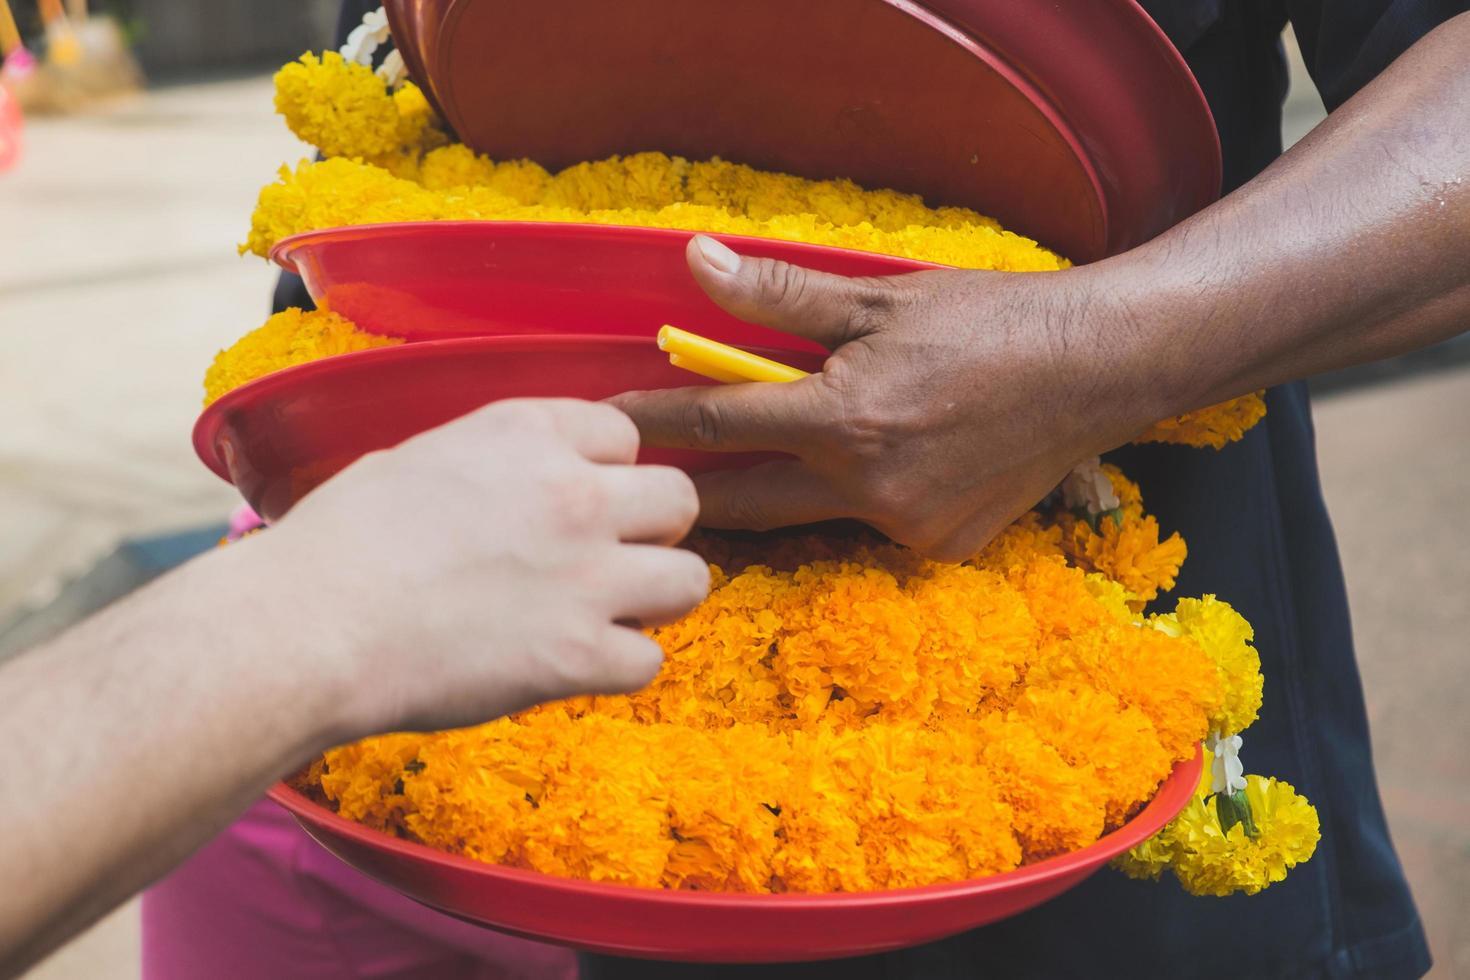 Seller's hand picking a tray of fresh marigold garland photo